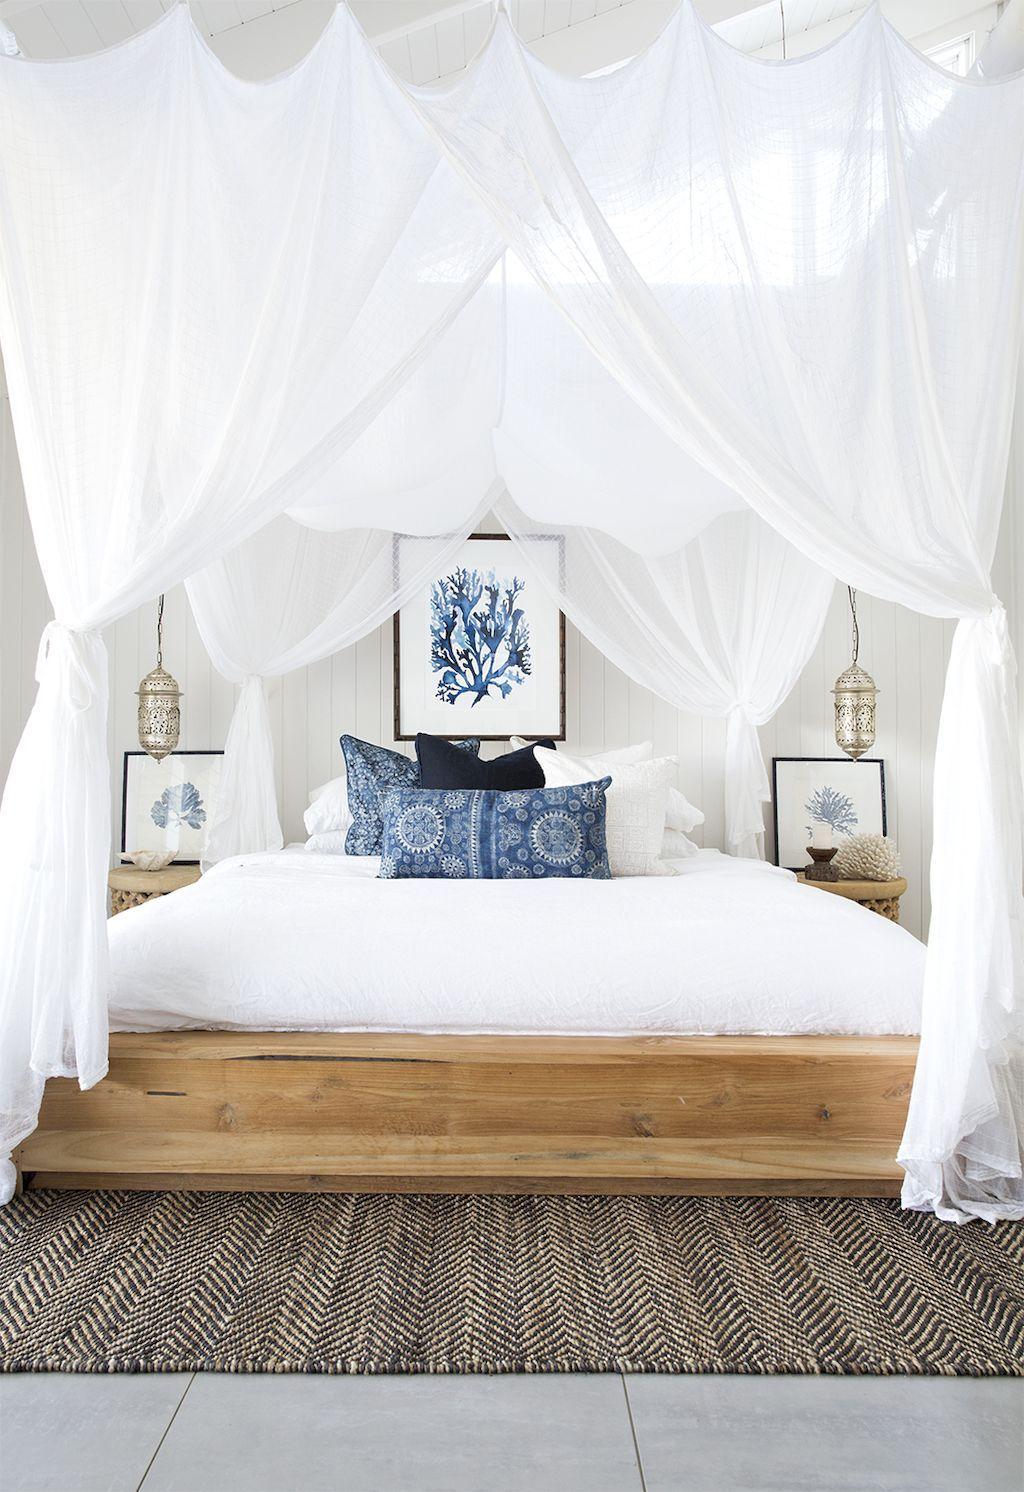 Nice 40 Amazing Modern Beach Bedroom Decor Ideas https://livinking.com/2017/06/09/40-amazing-modern-beach-bedroom-decor-ideas/